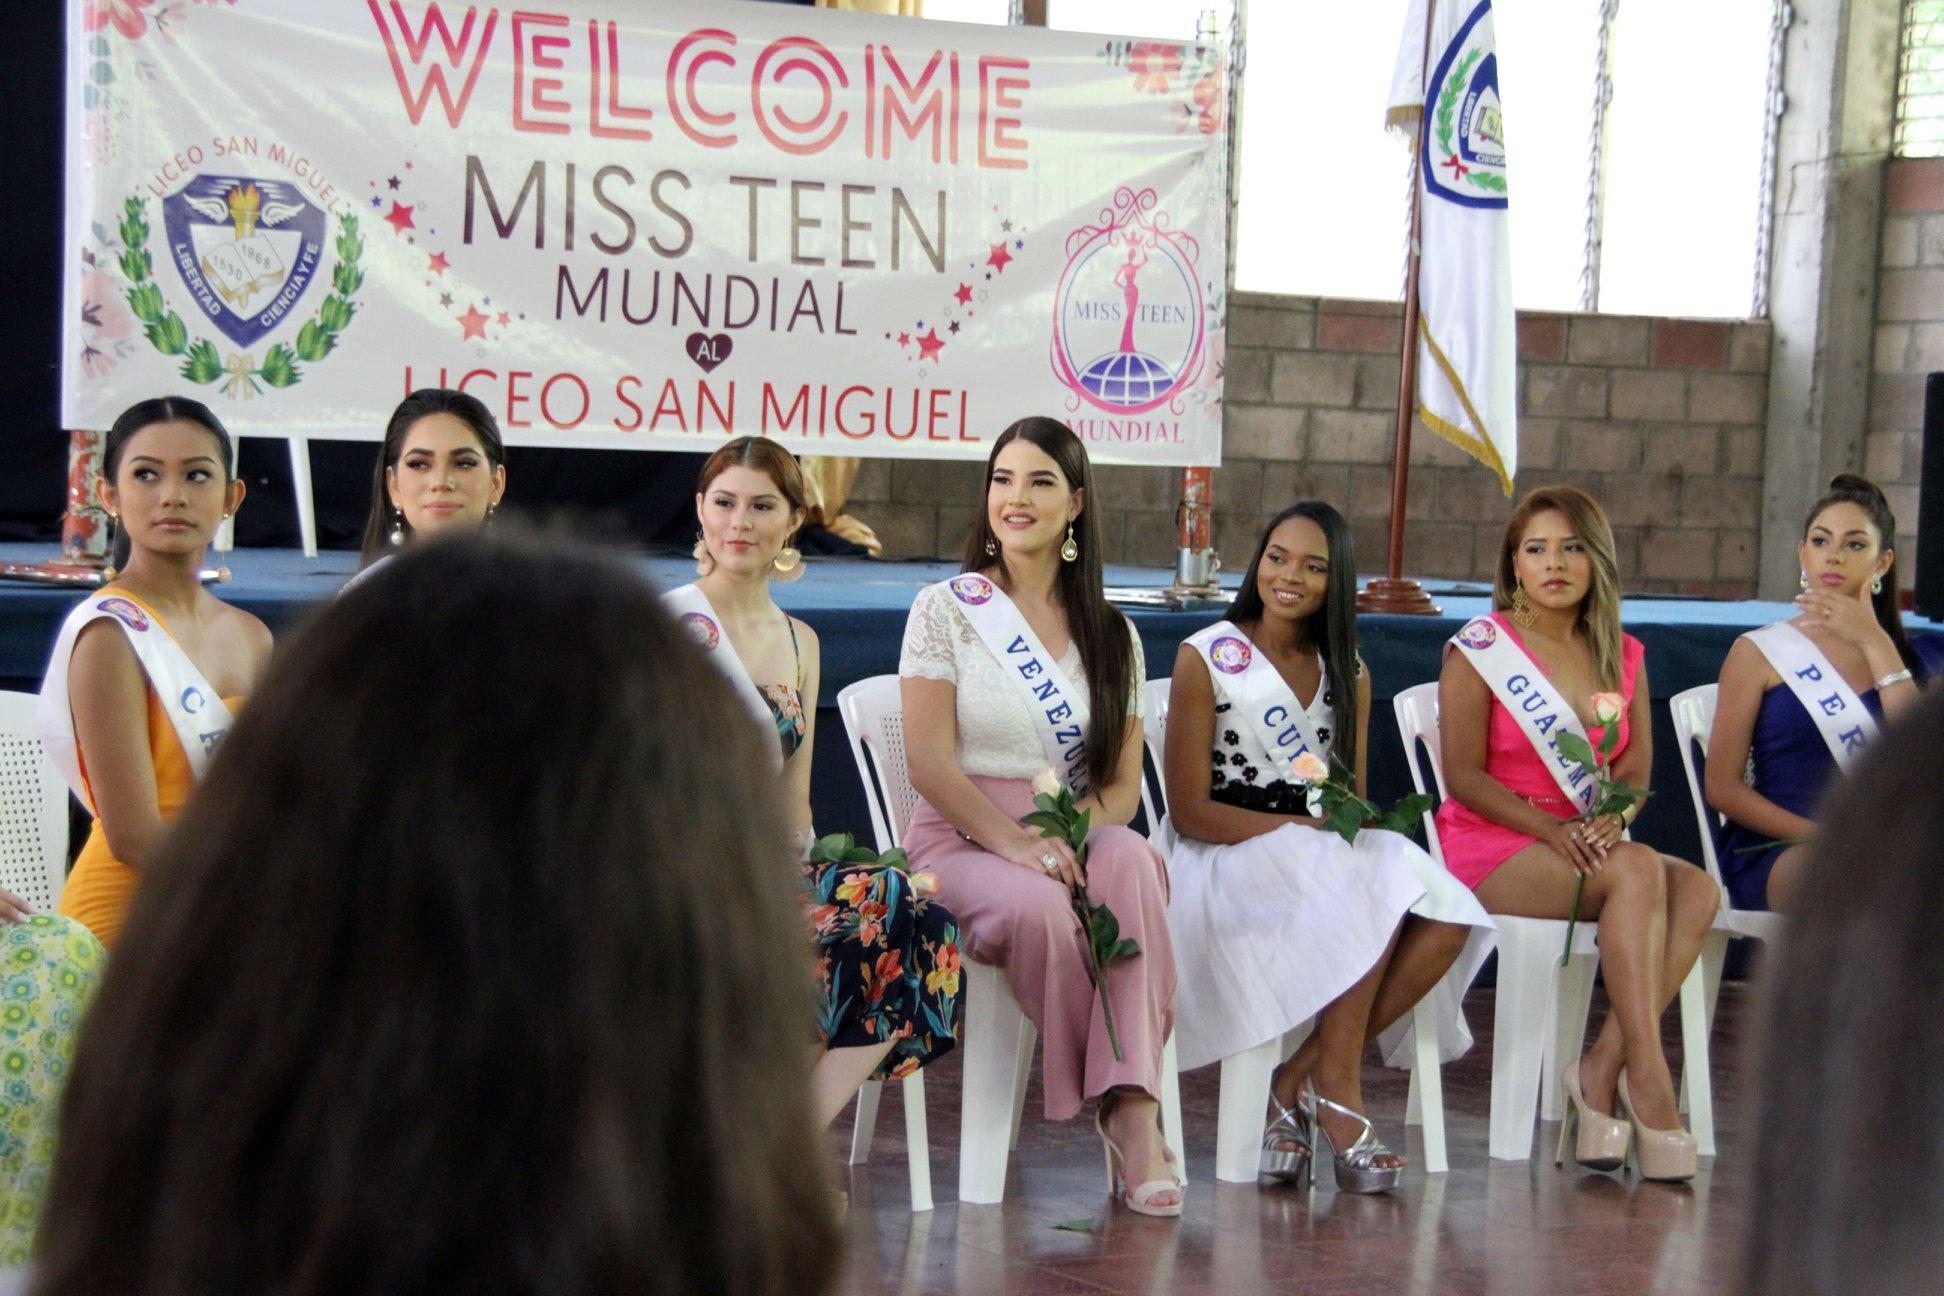 daniela di venere, top 12 de miss teen mundial 2019. - Página 6 60634410